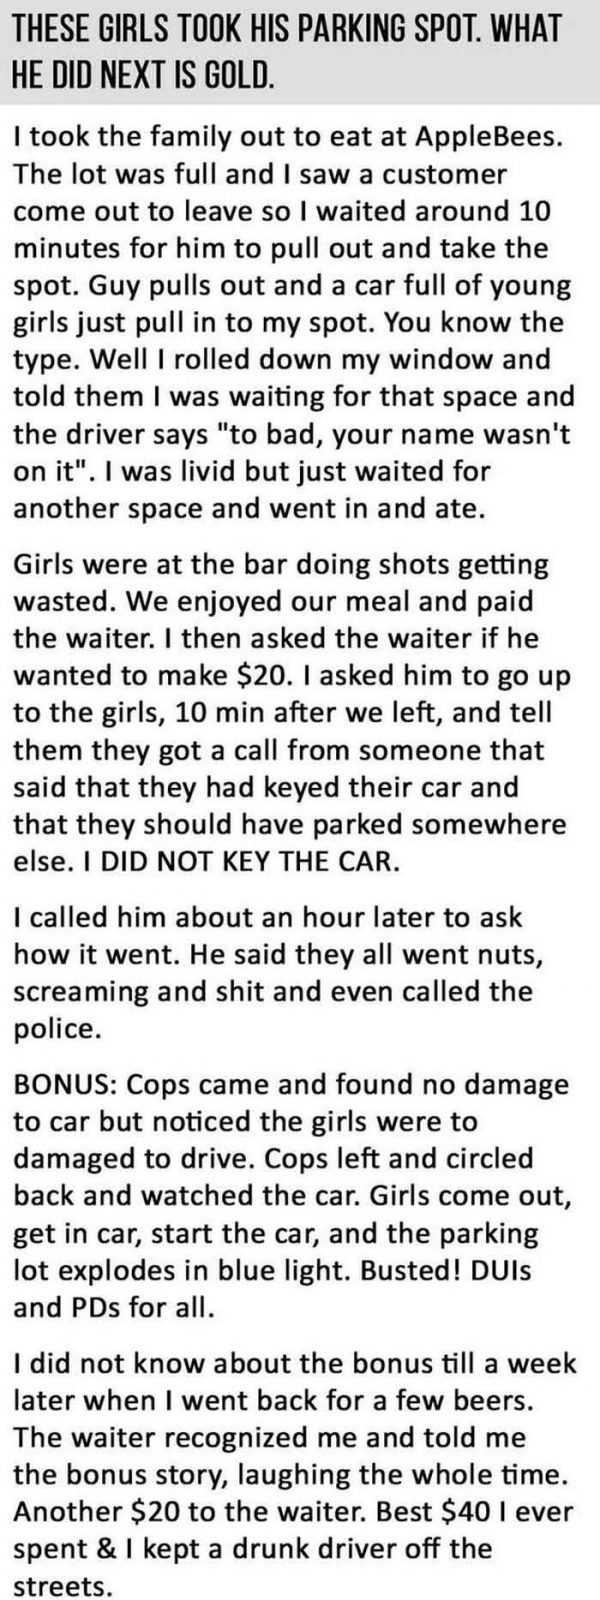 Short Story Hilarious One About Parking Etiquette